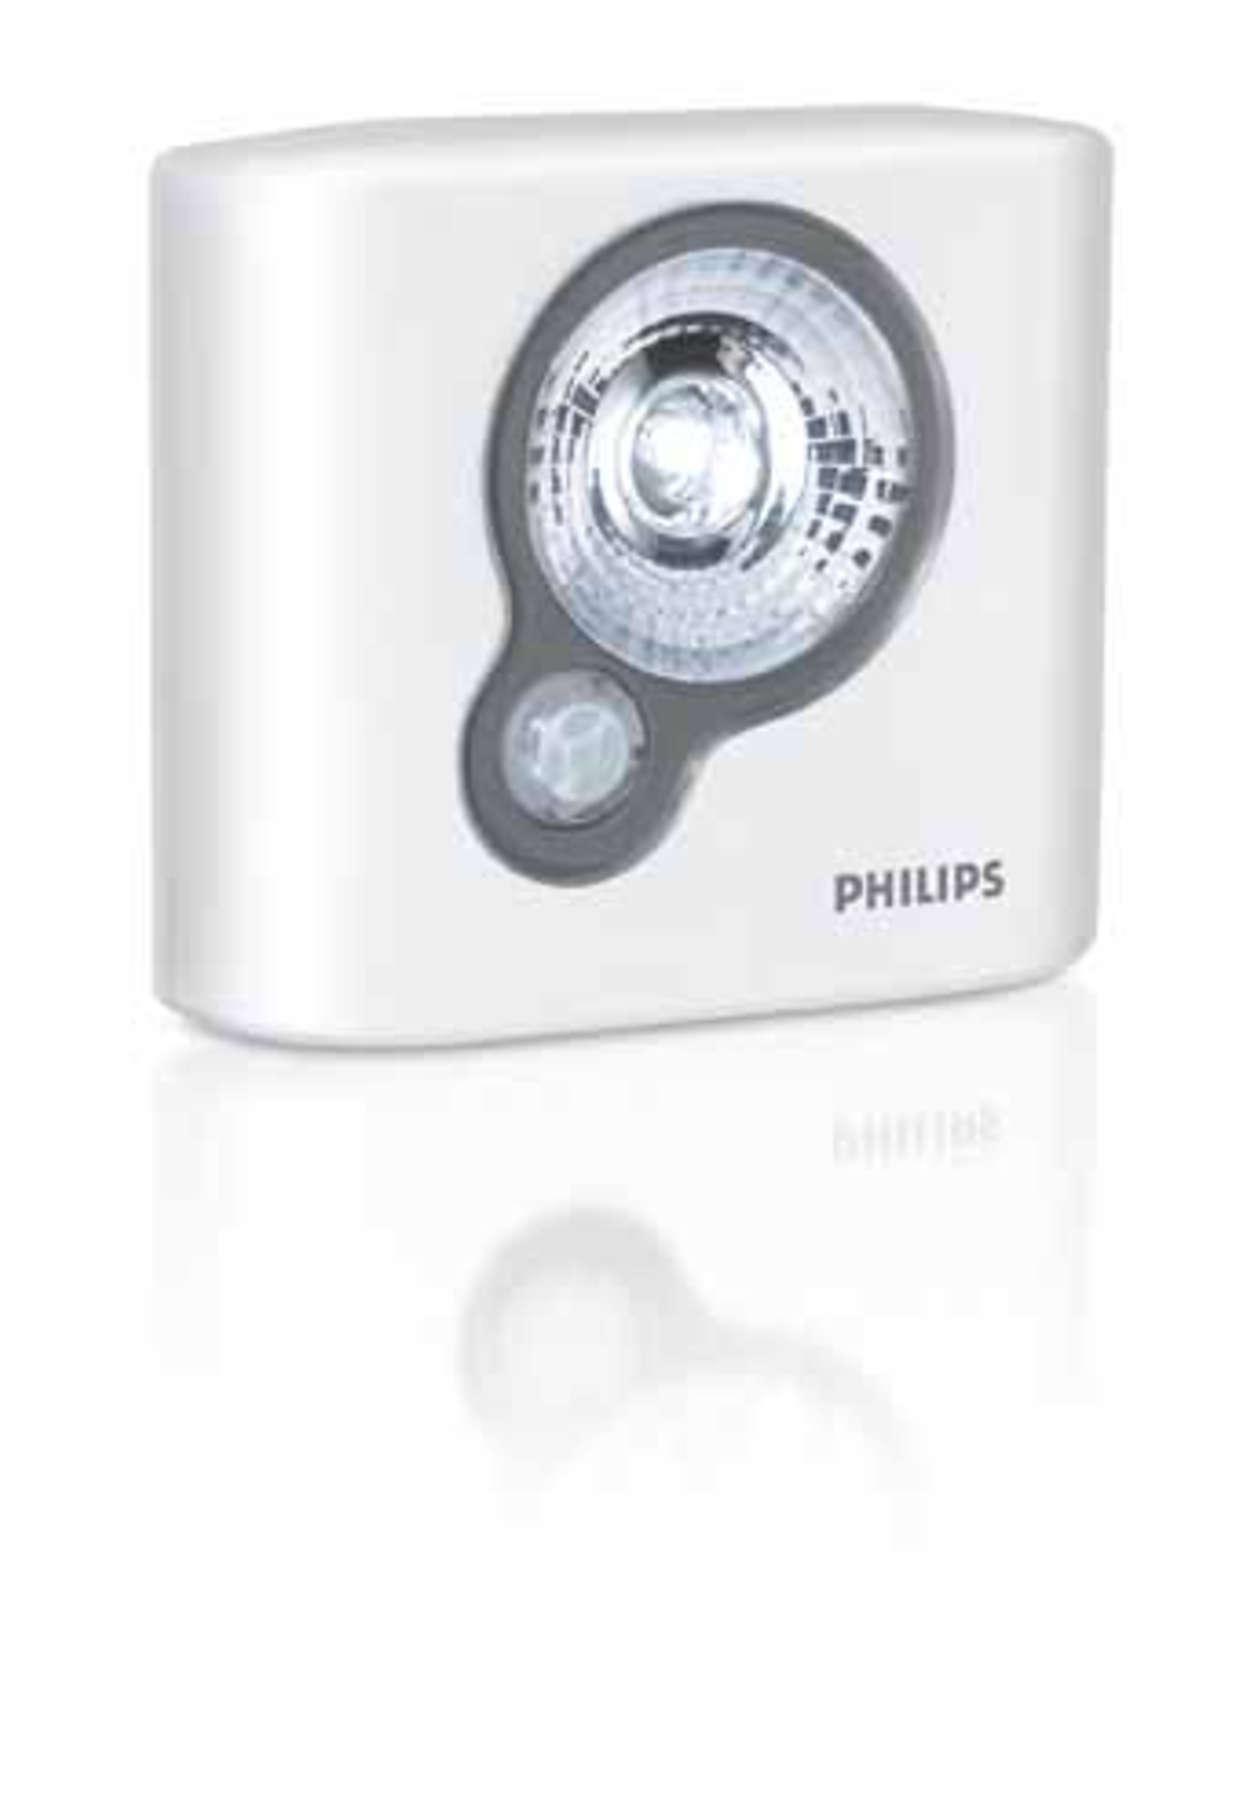 Batteriebetriebene Led Lampe Lac52awwb 10 Philips